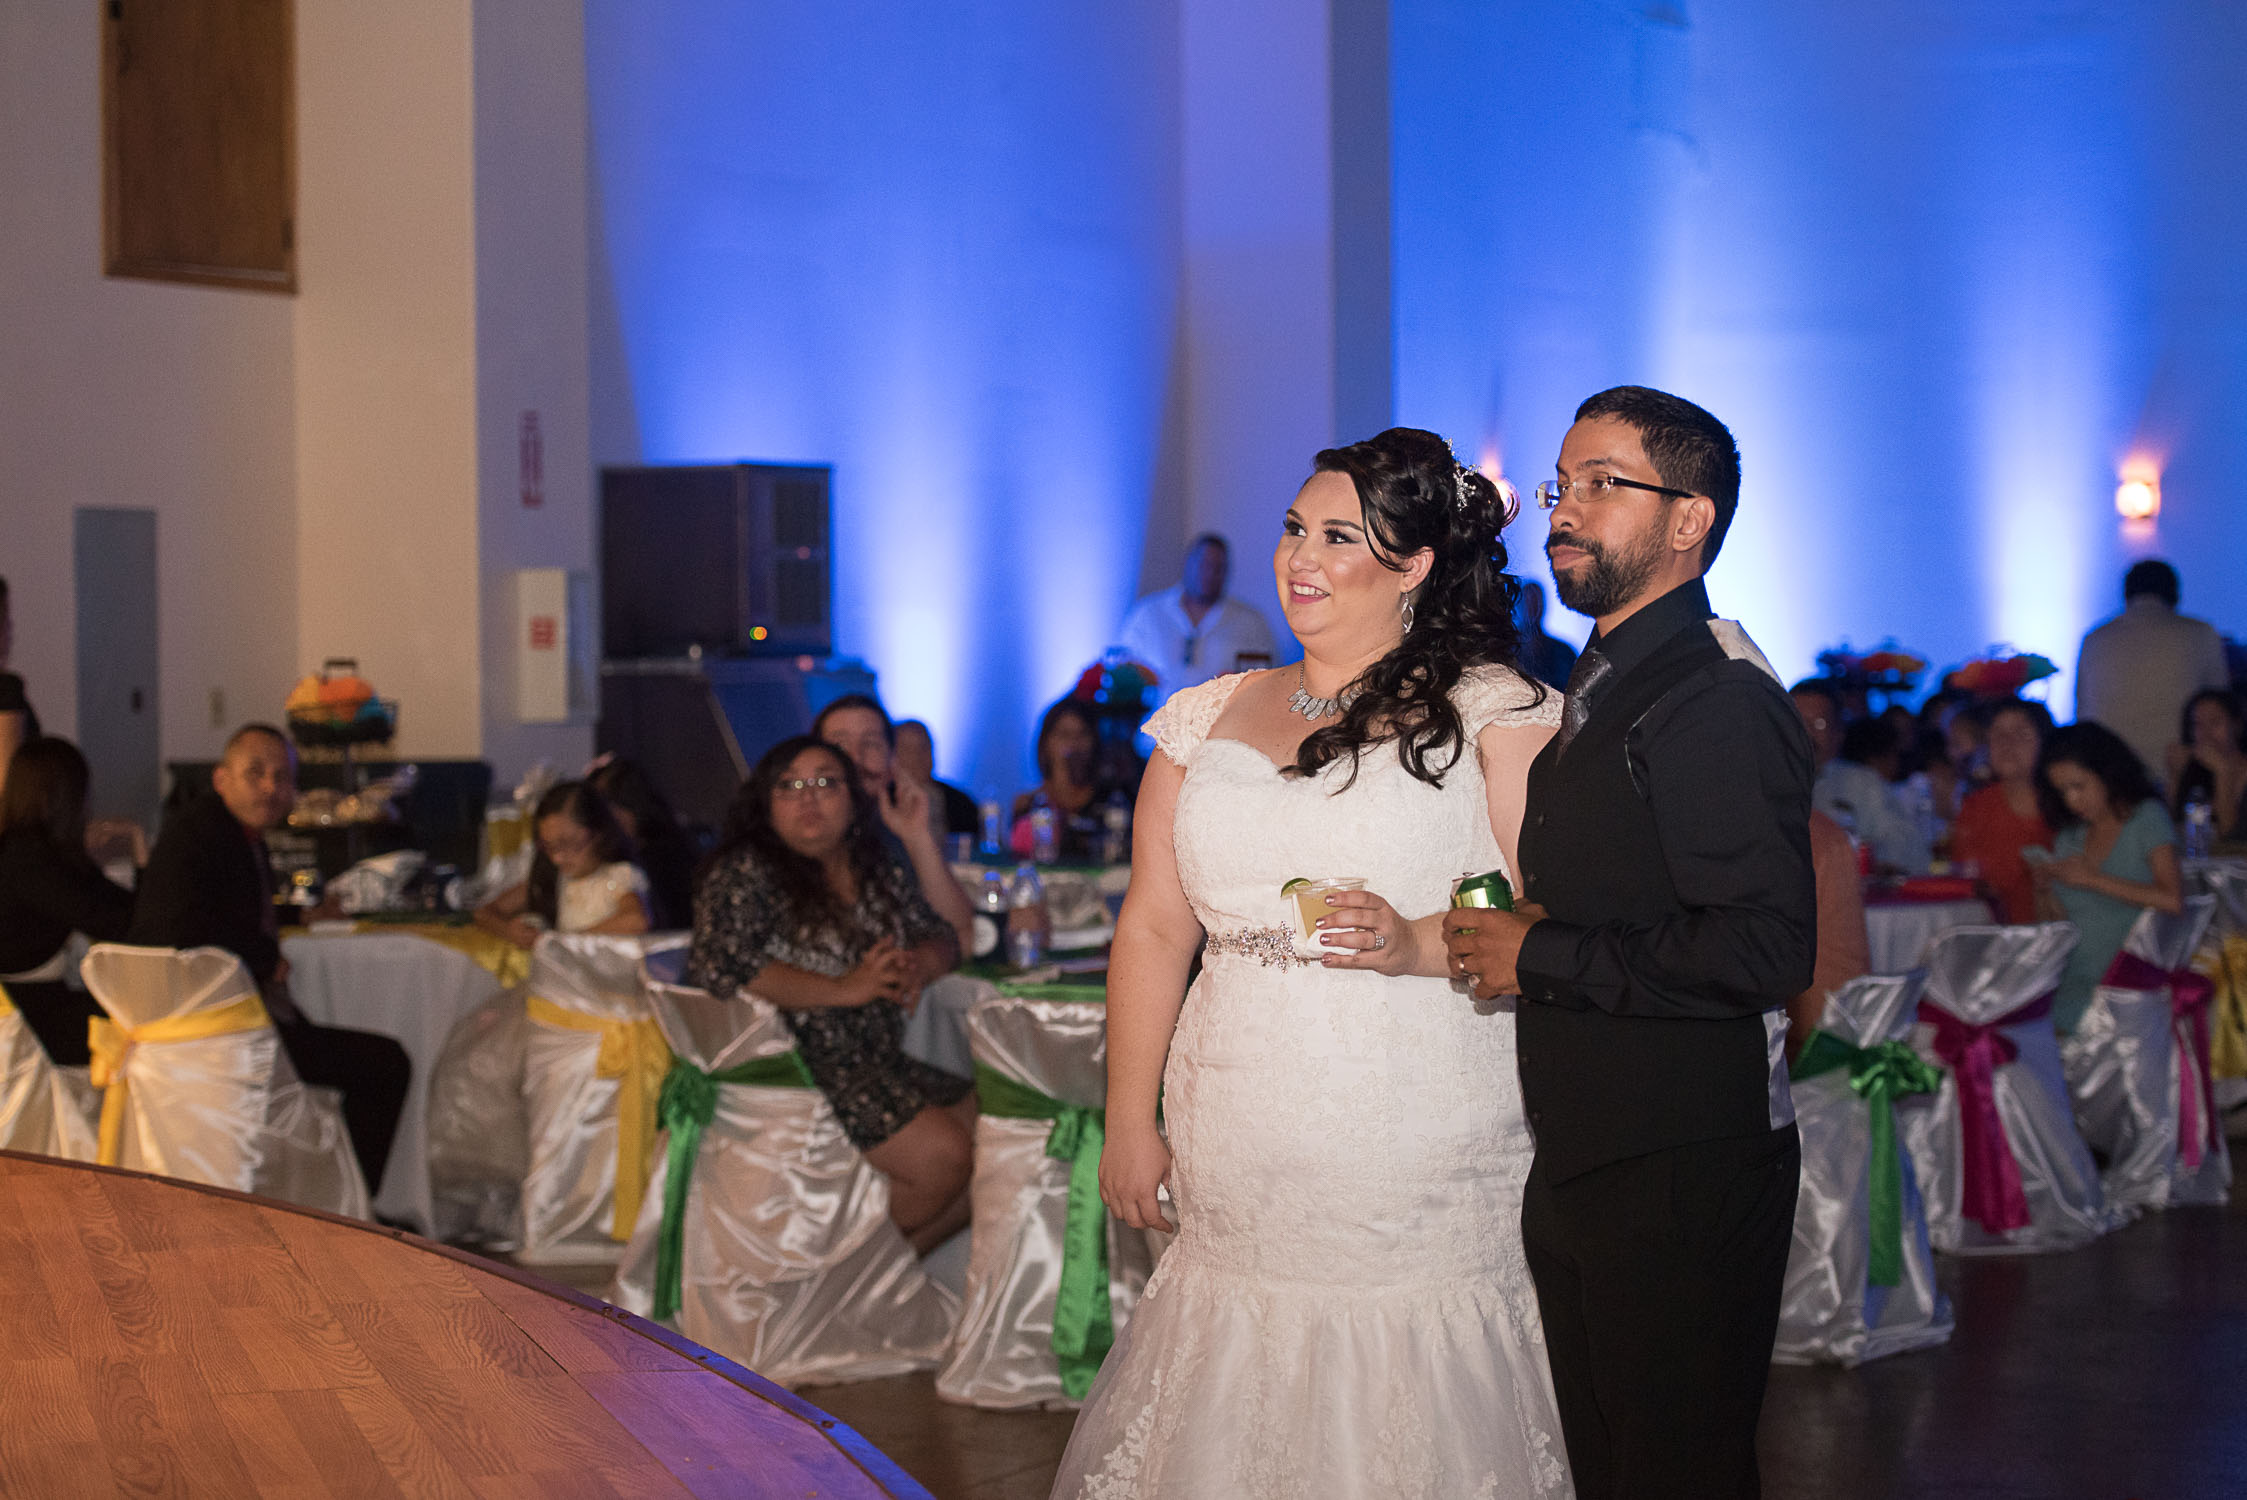 Leal Wedding Mira Visu Photography-157.jpg